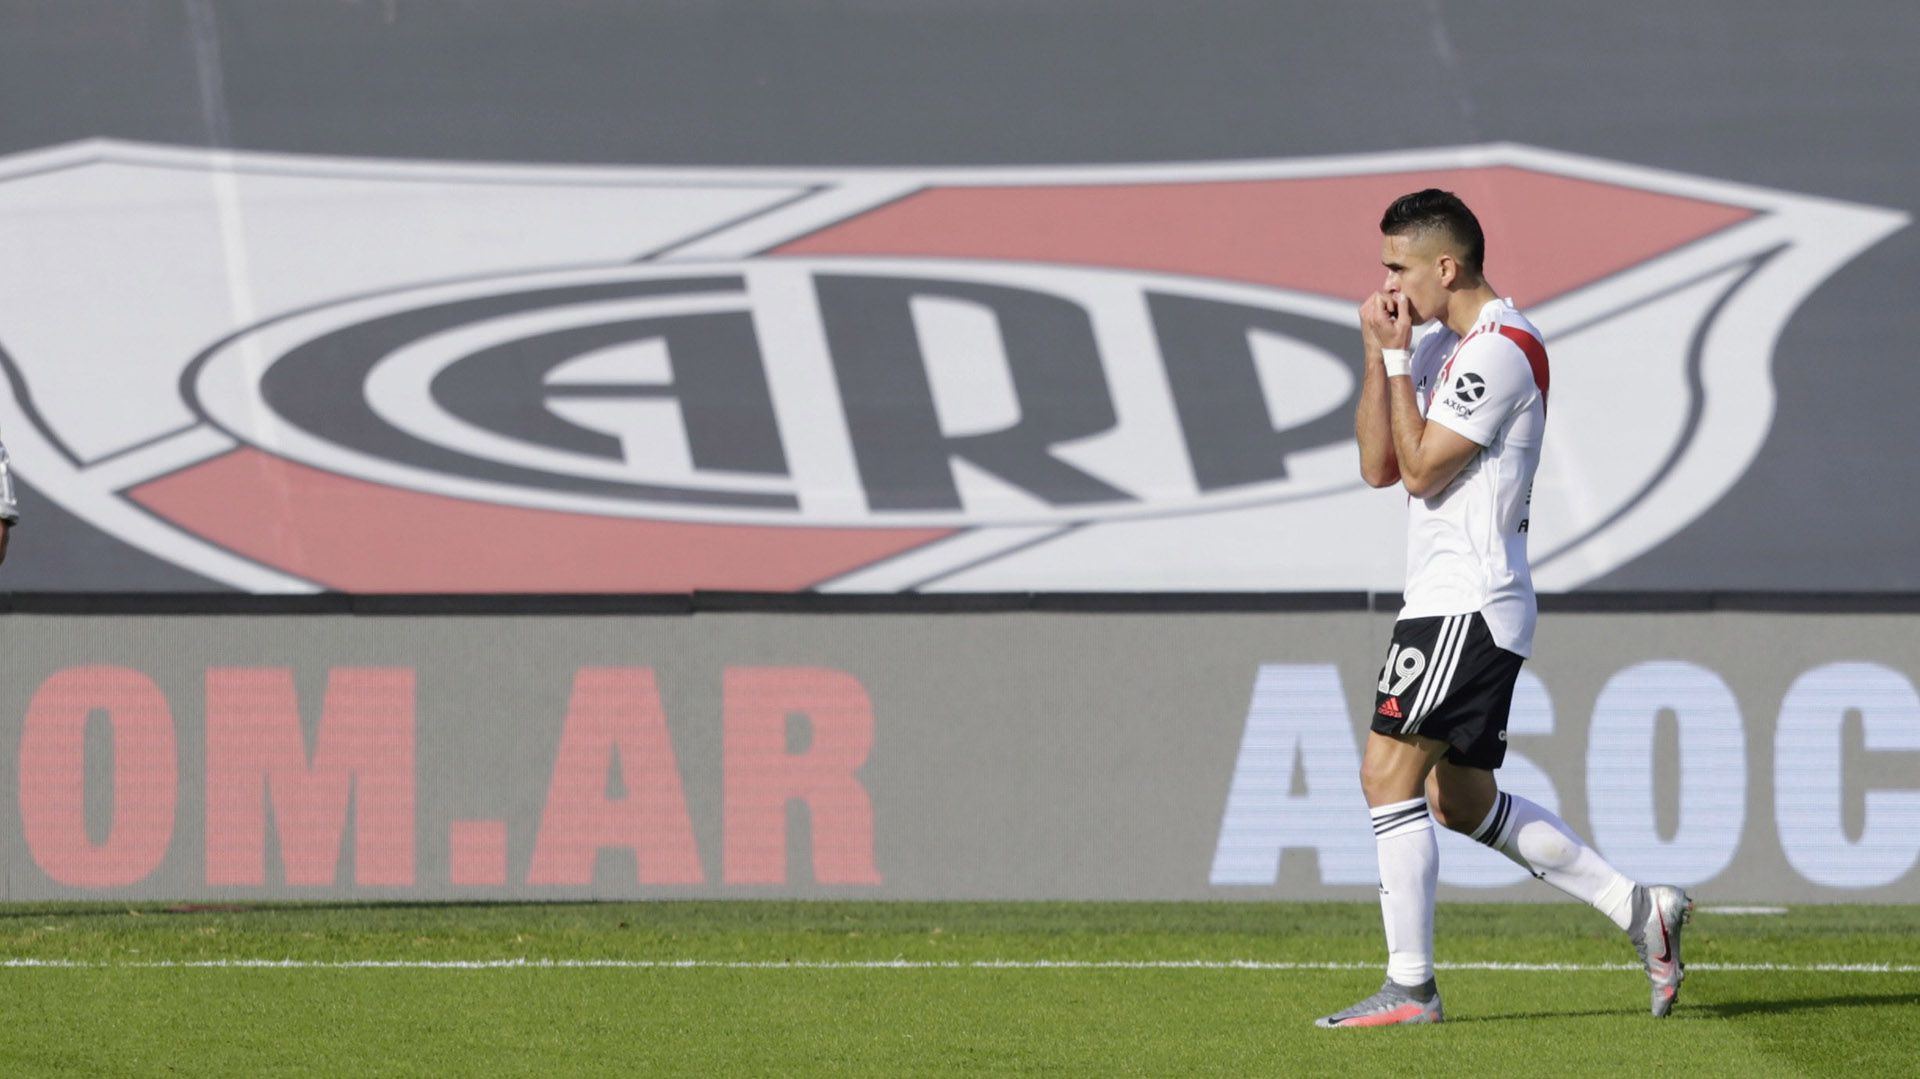 River Plate vs Aldosivi - Copa de la Liga Profesional Argentina